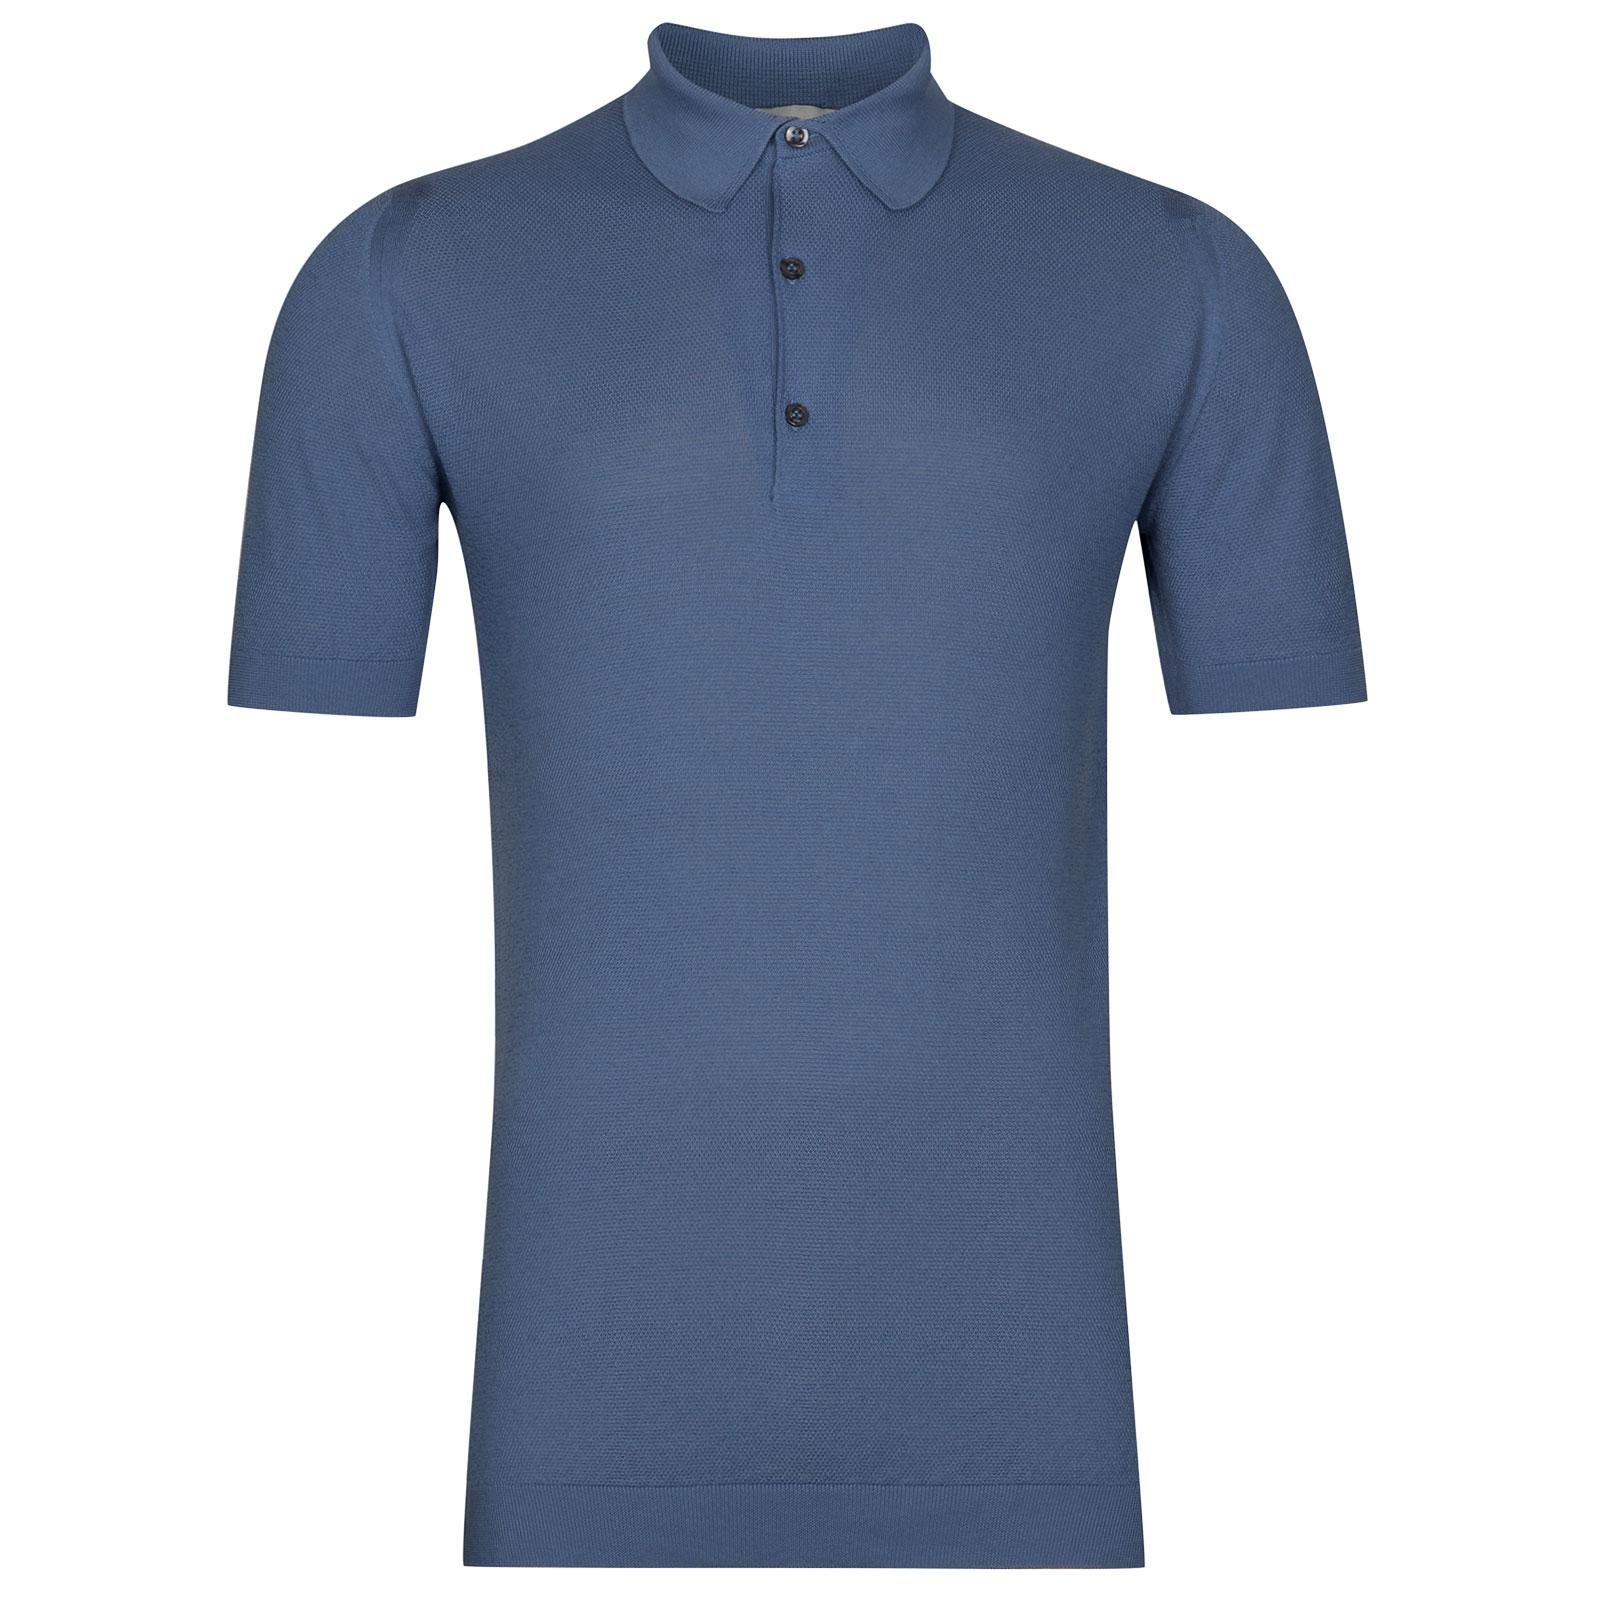 John Smedley Roth in Blue Iris Shirt-LGE